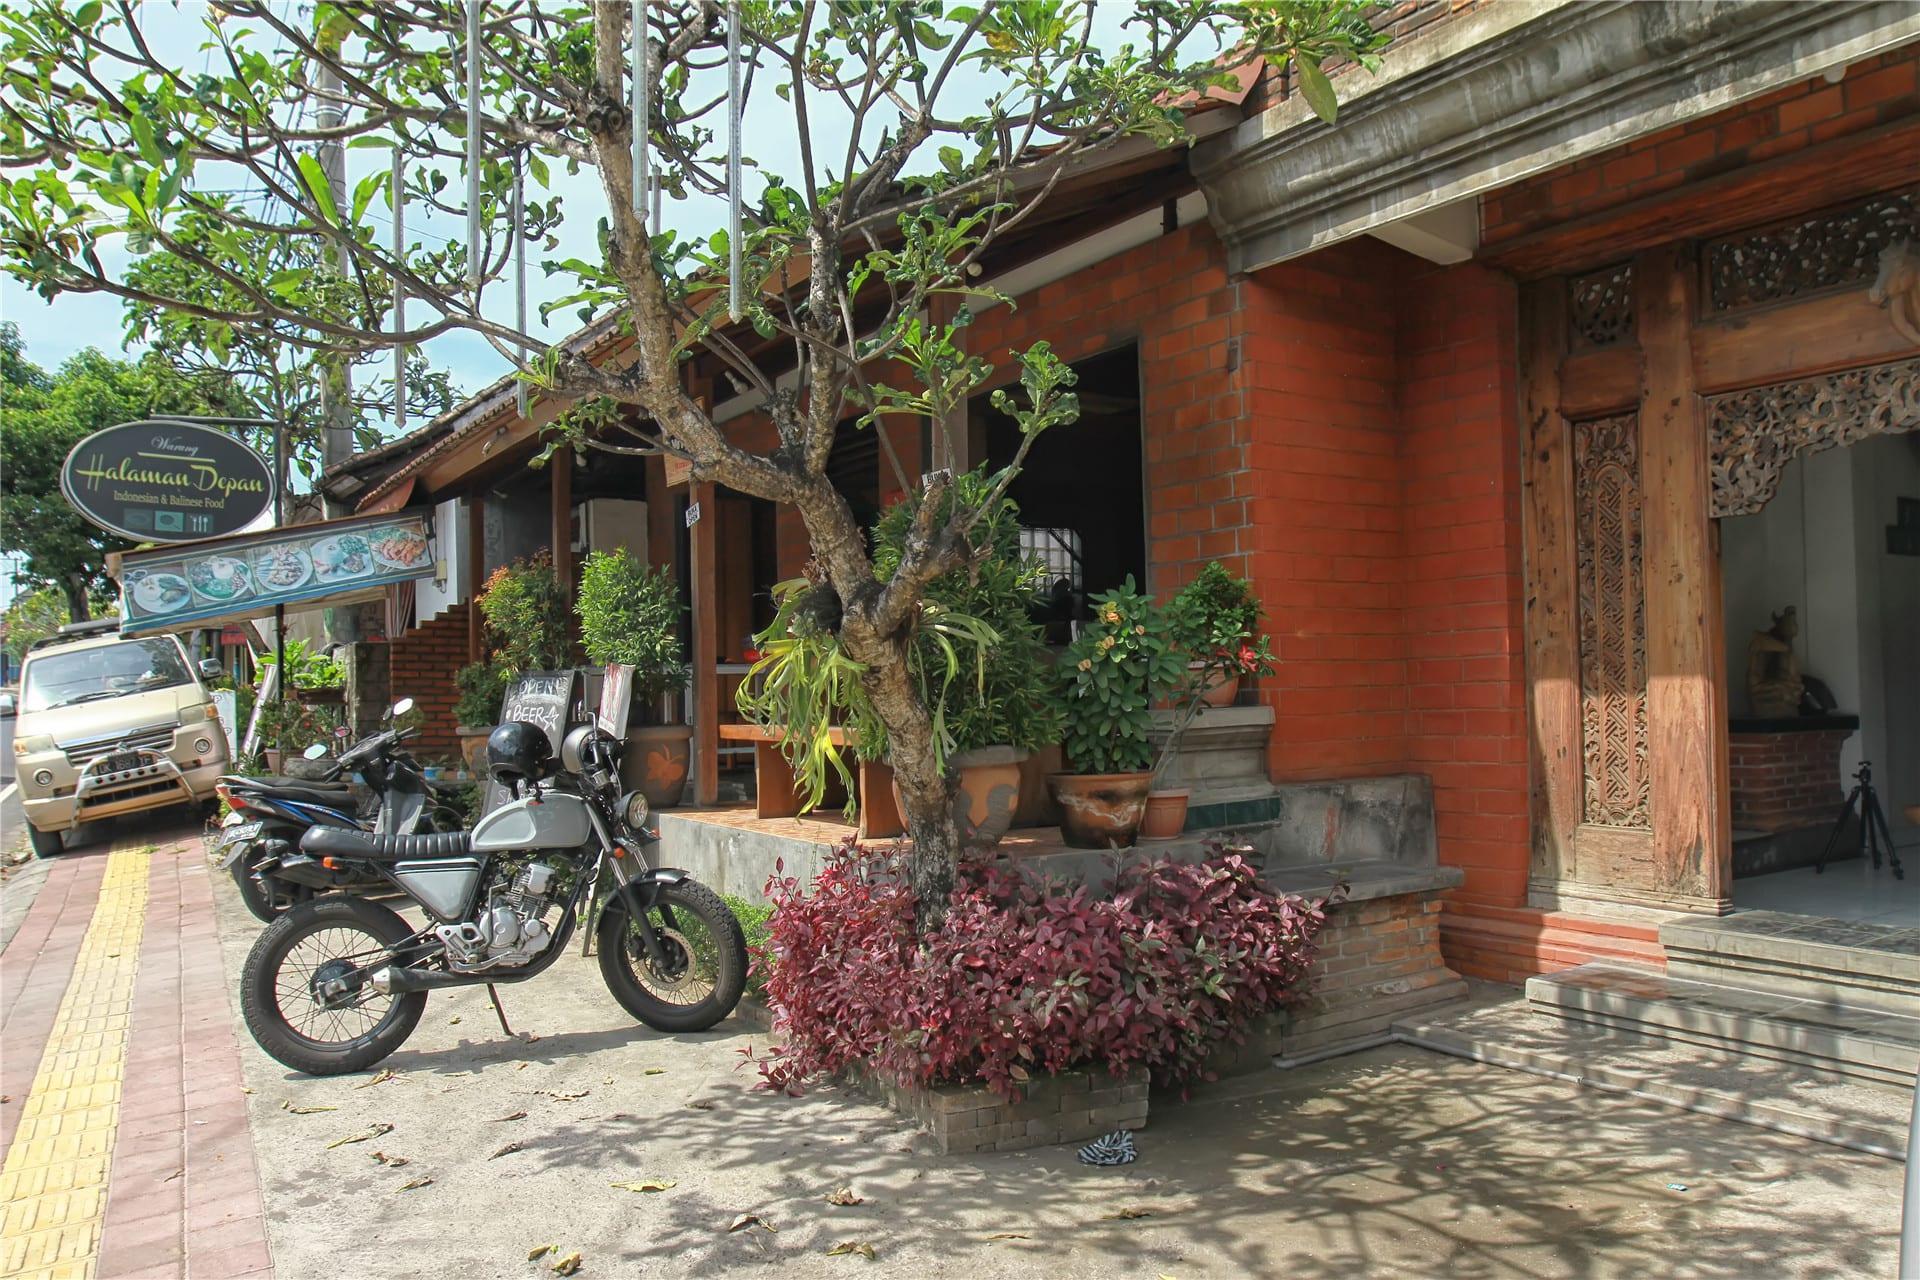 HOSTEL - Halaman Depan Hostel Ubud